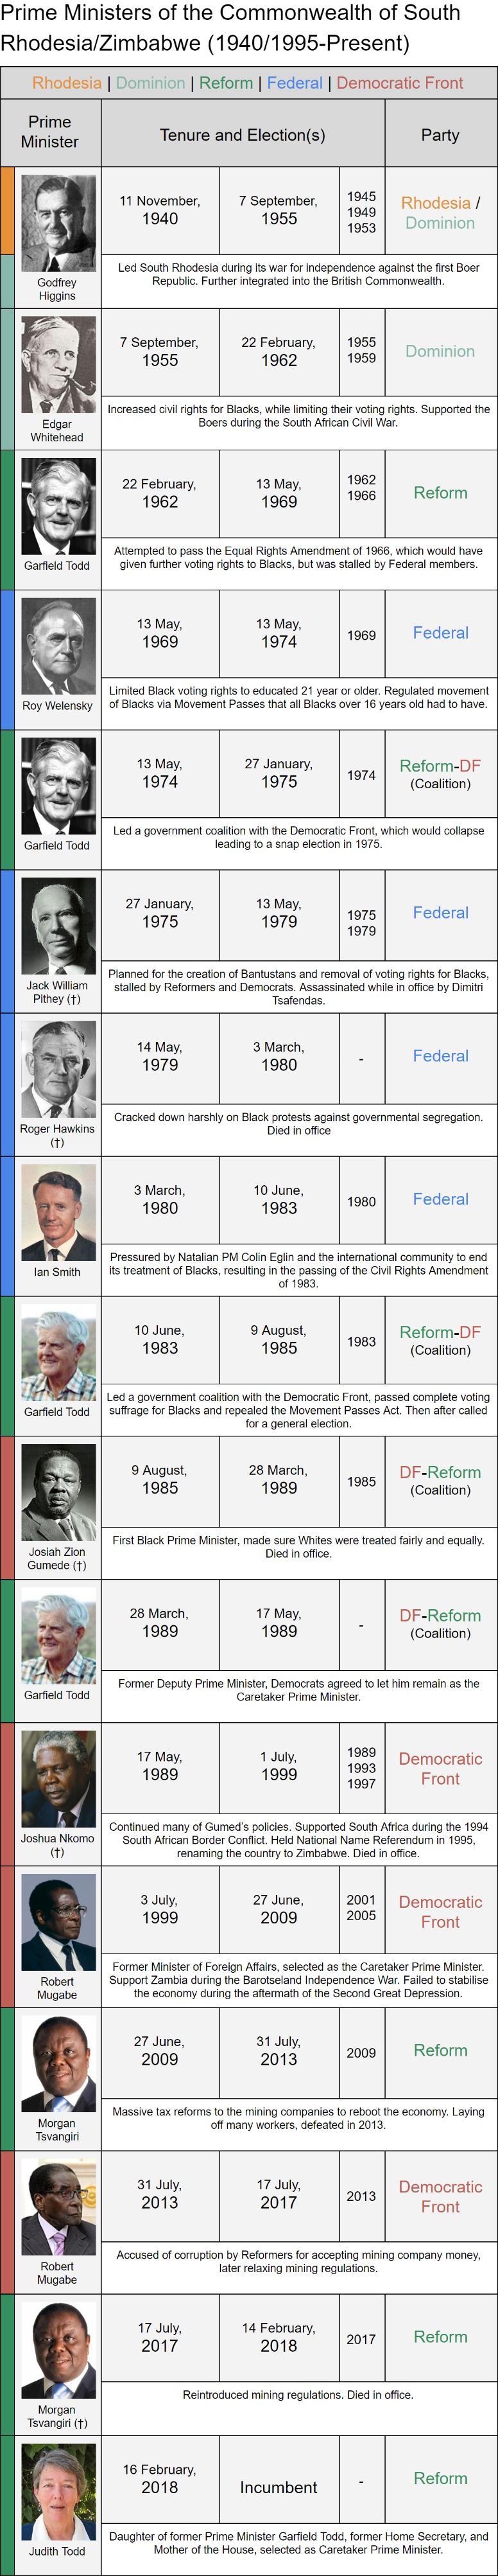 Zimbawan Prime Ministers2 PEG.jpg